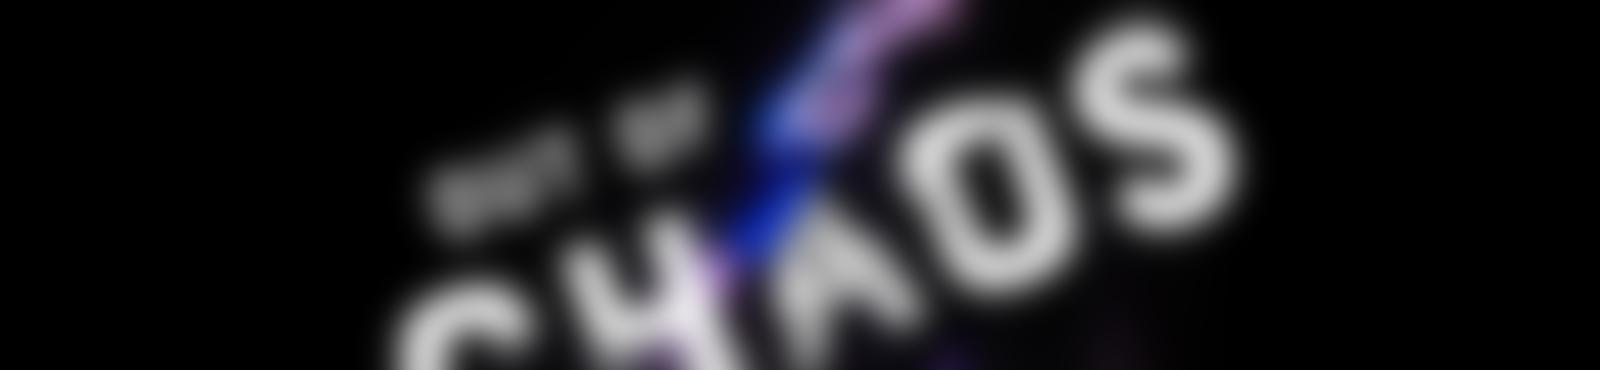 Blurred d3f3b28c 525c 40a5 92d3 f87468566cf2